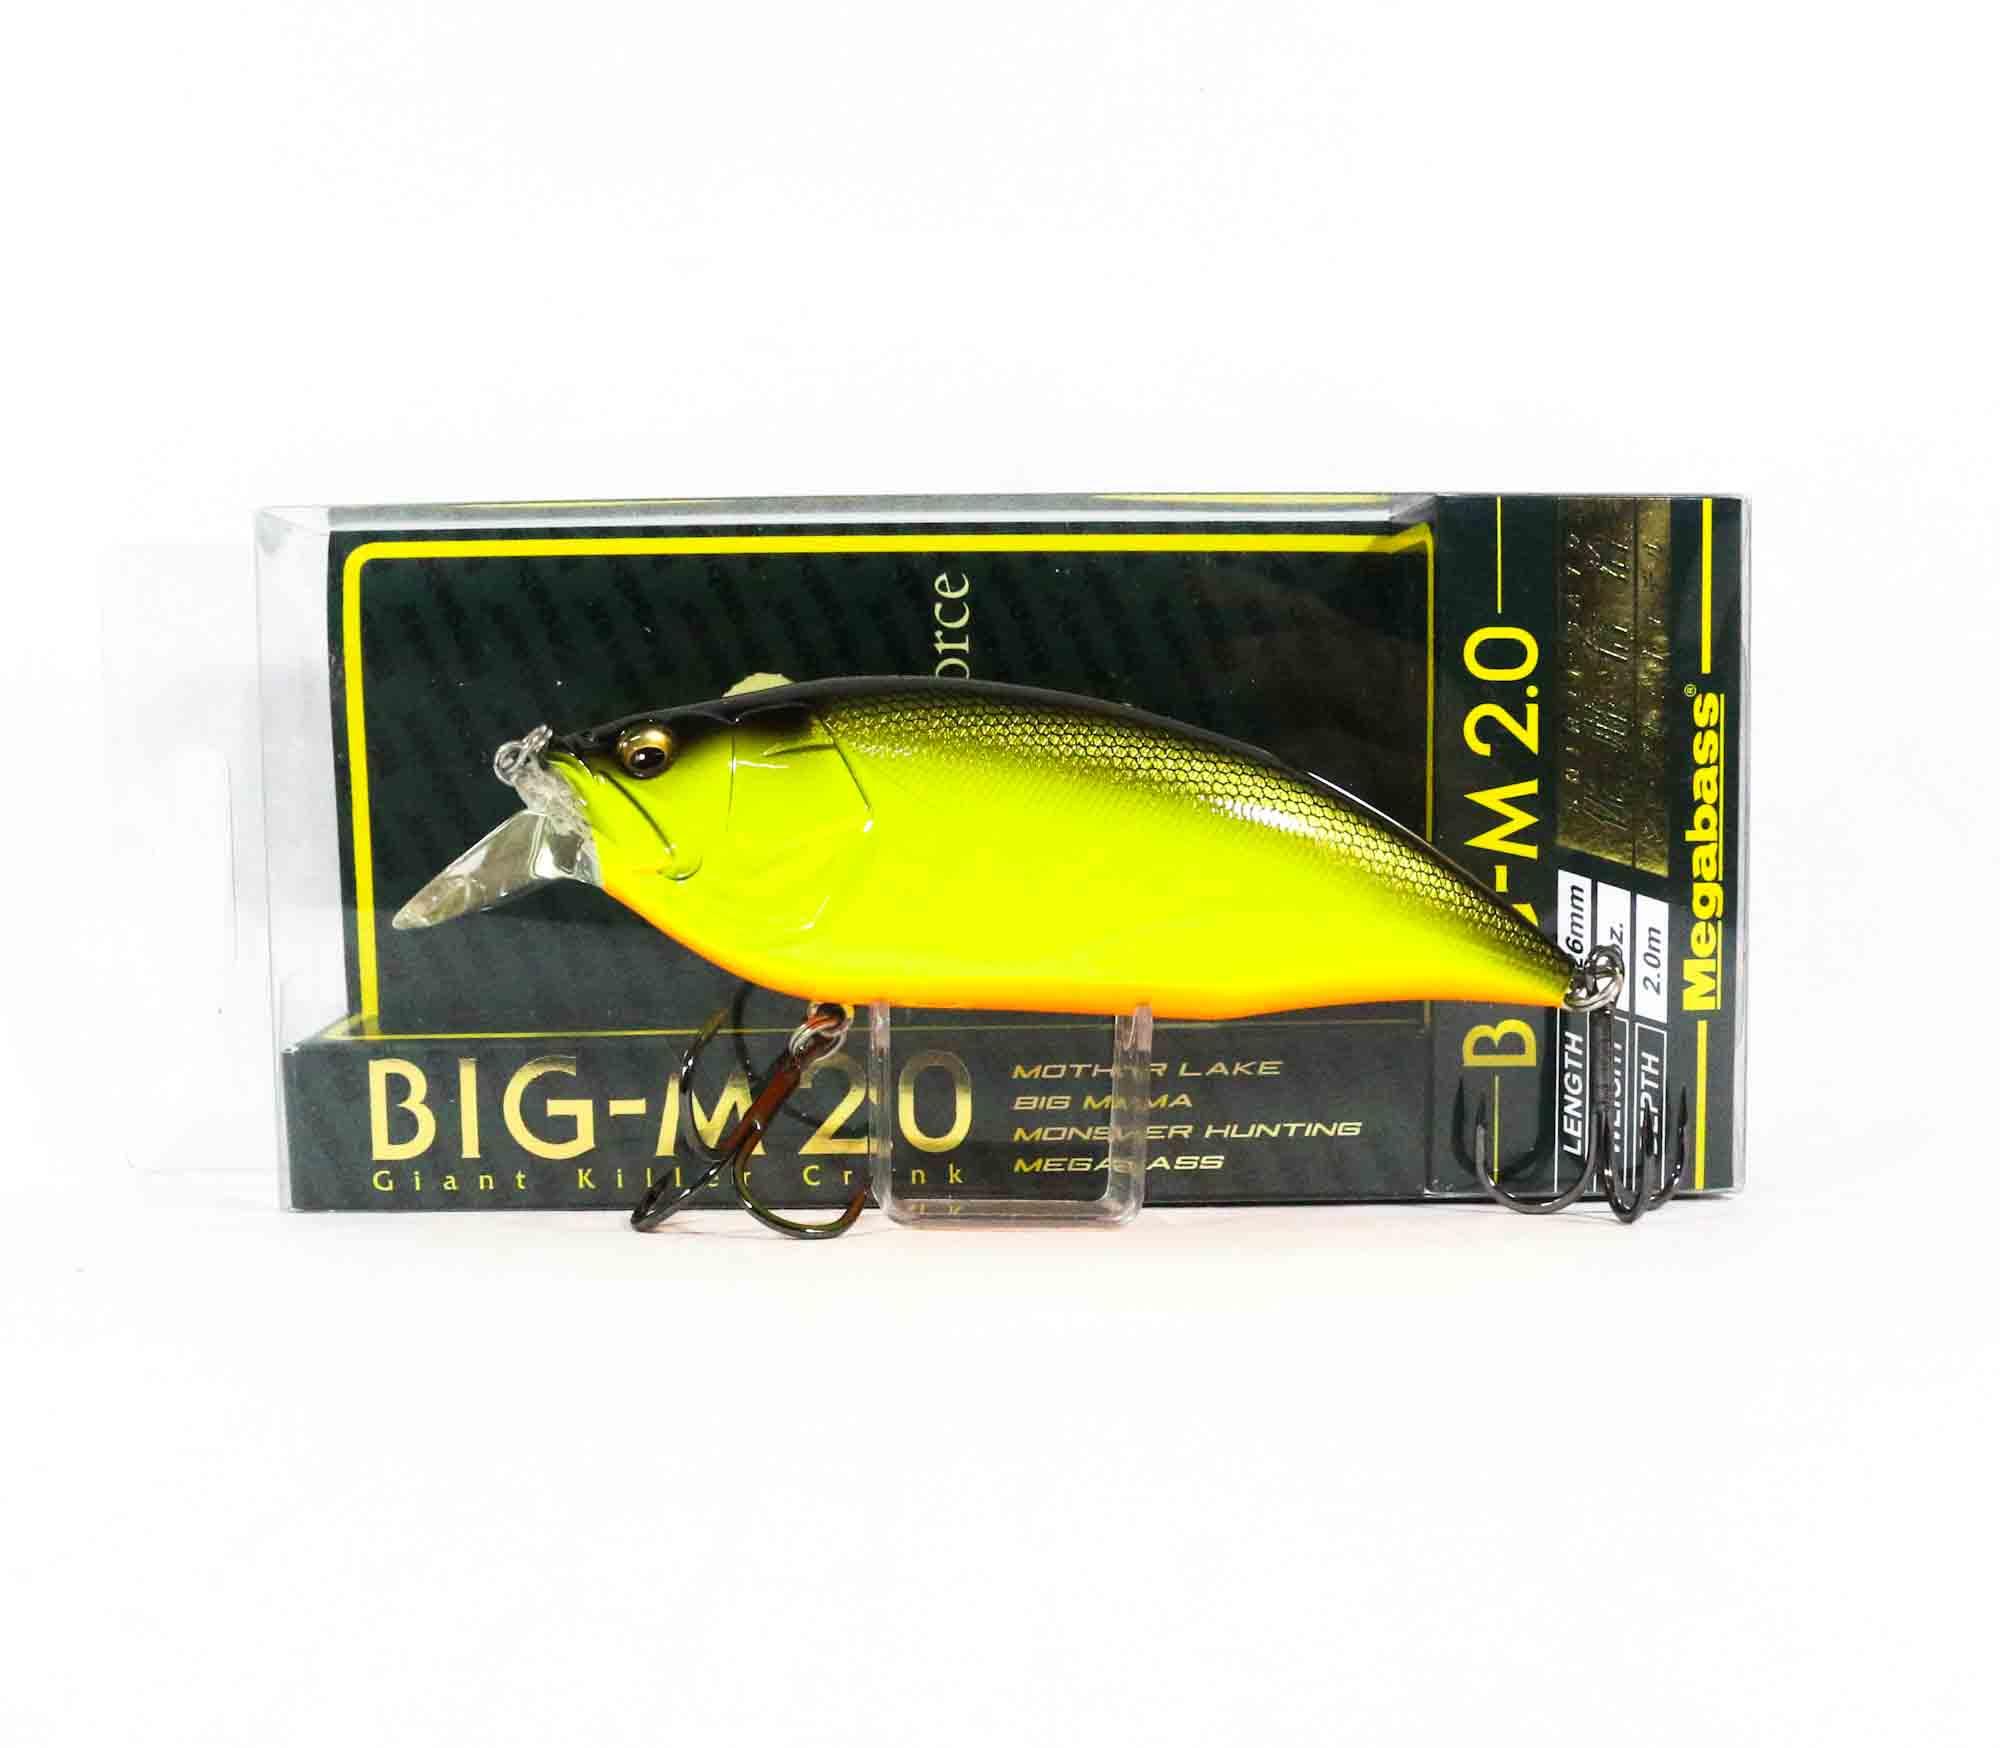 Megabass Big M 2.0 Giant Crank 126 mm Floating Lure BBC (6210)